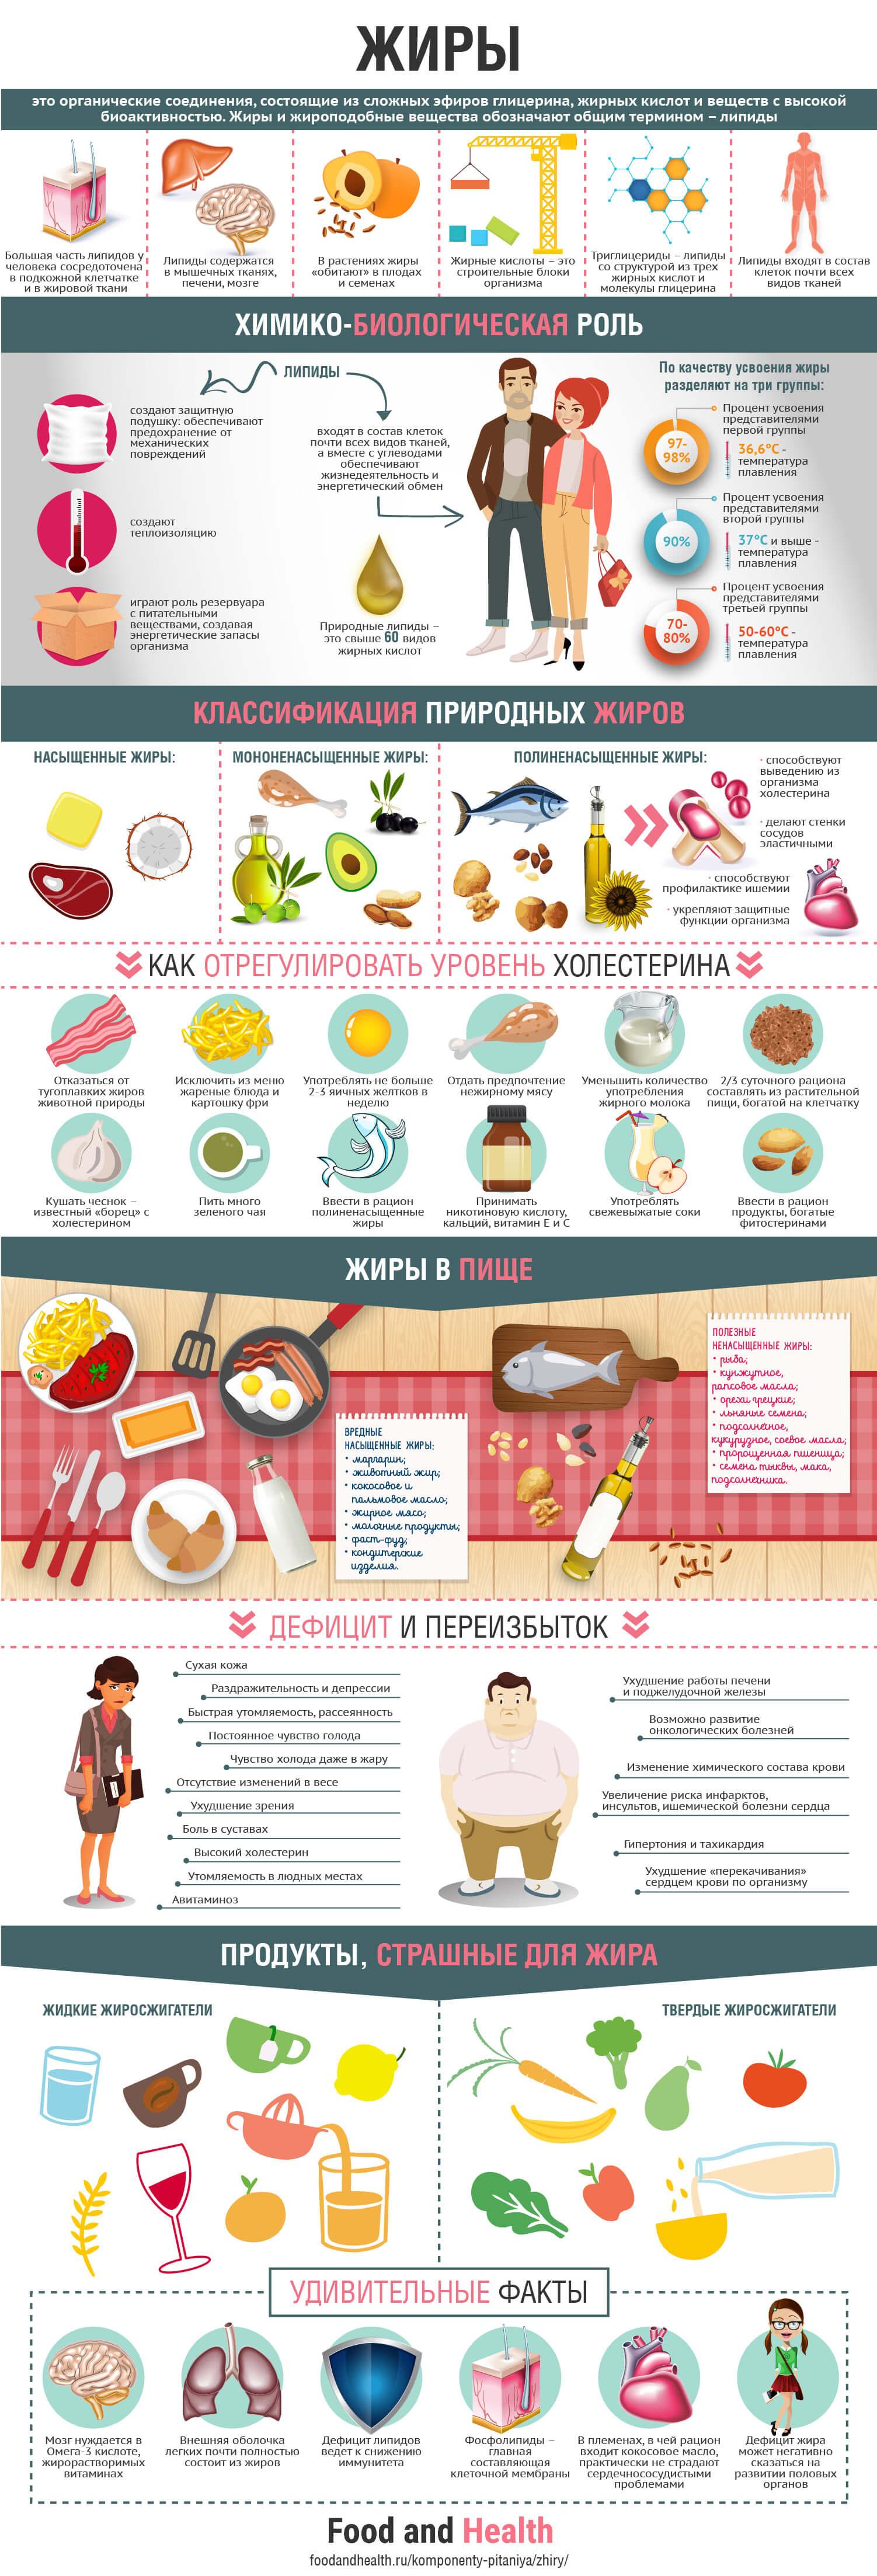 Жиры: инфографика